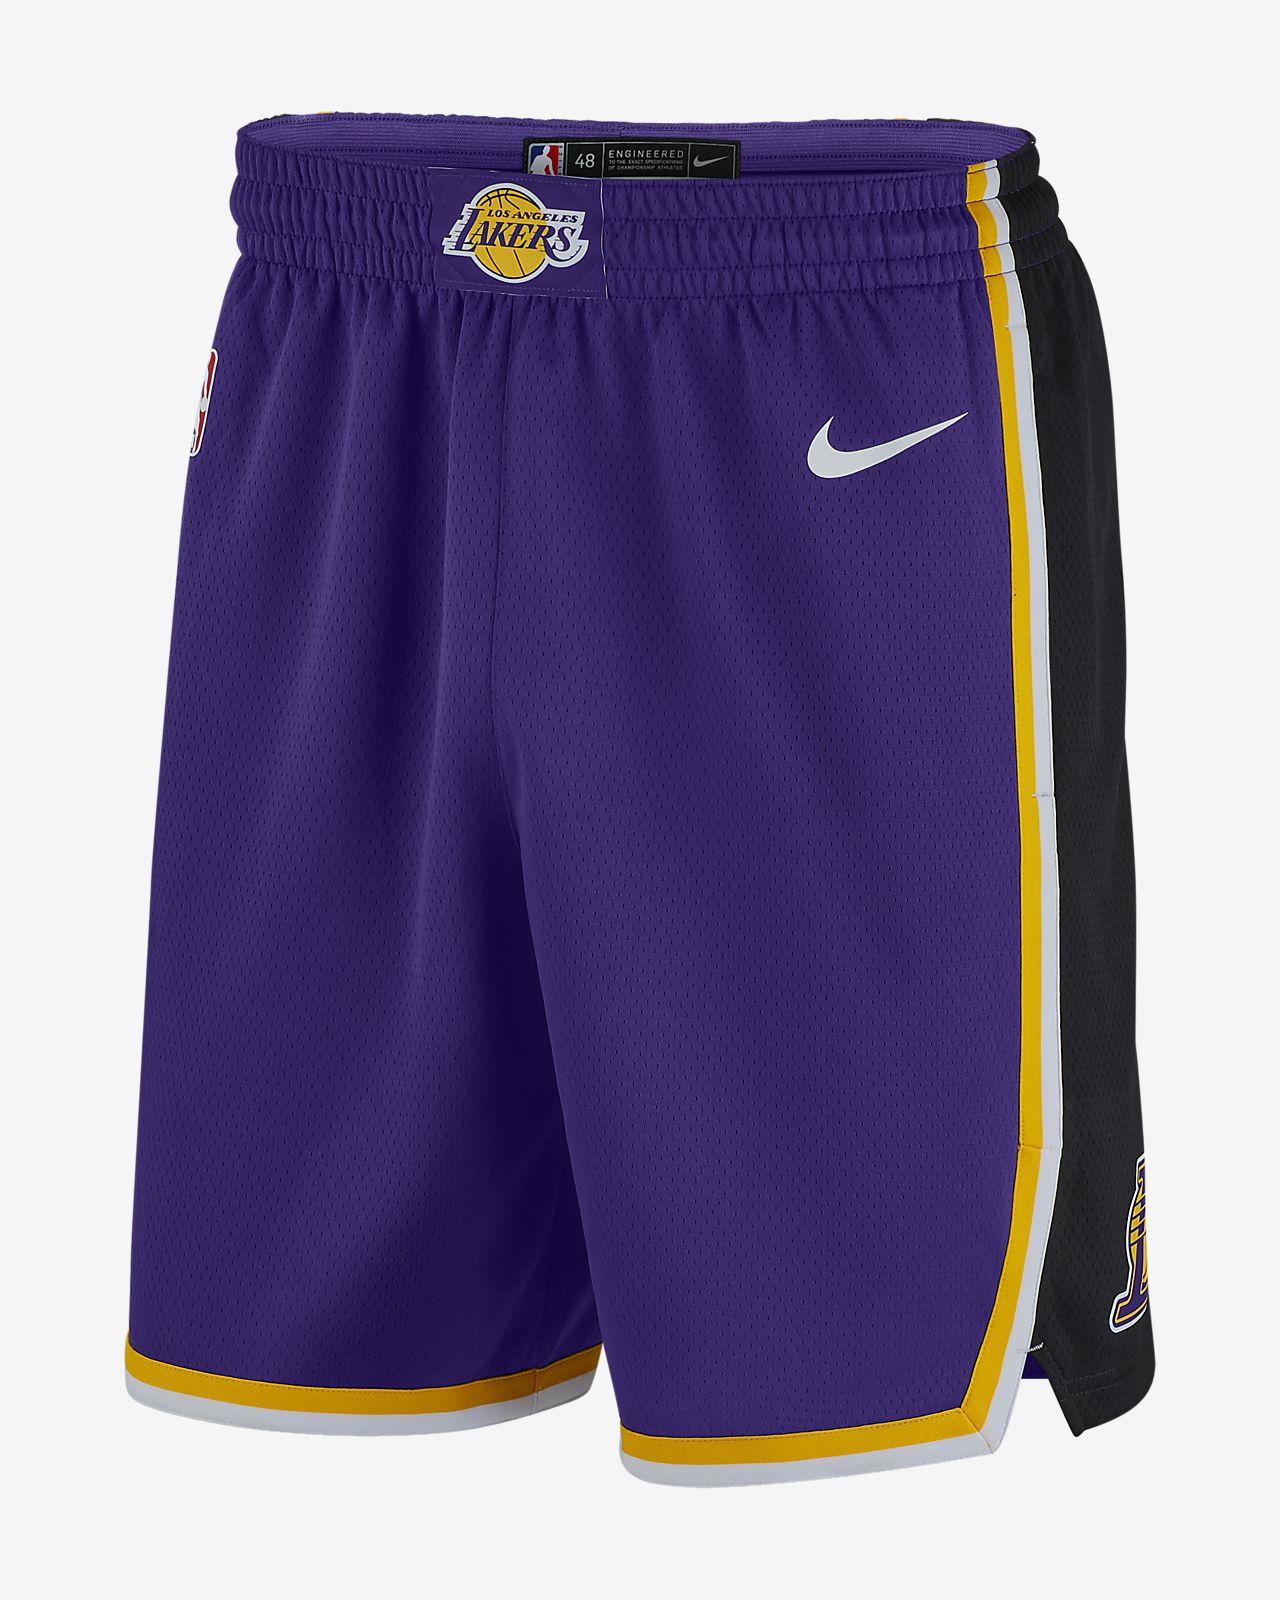 Los Angeles Lakers Statement Edition Swingman Nike NBA-herenshorts